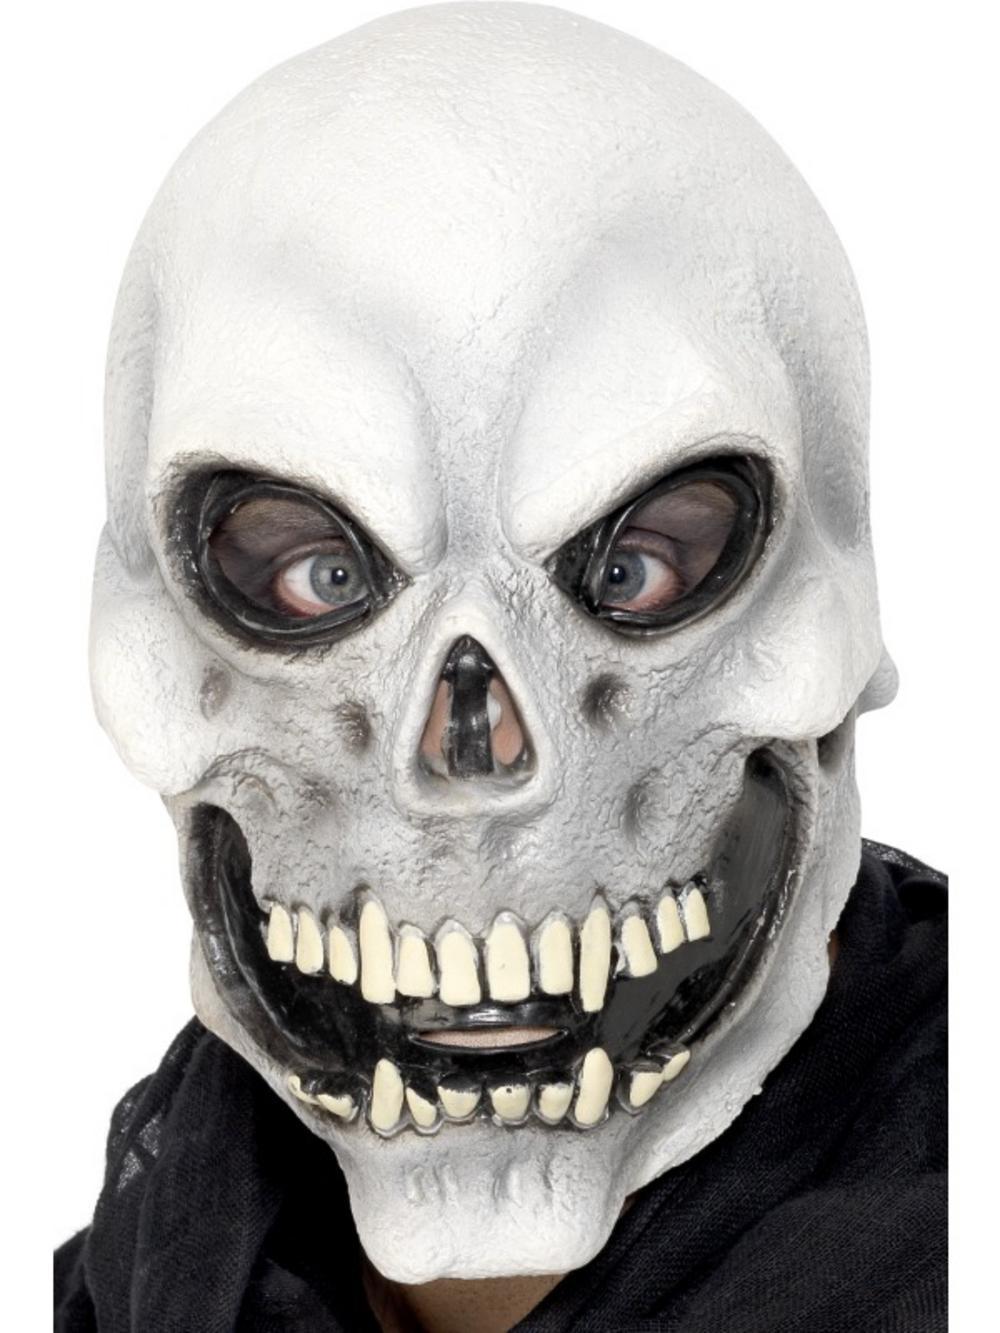 Skull Mask Halloween | All Mens Halloween Costumes | Mega Fancy Dress